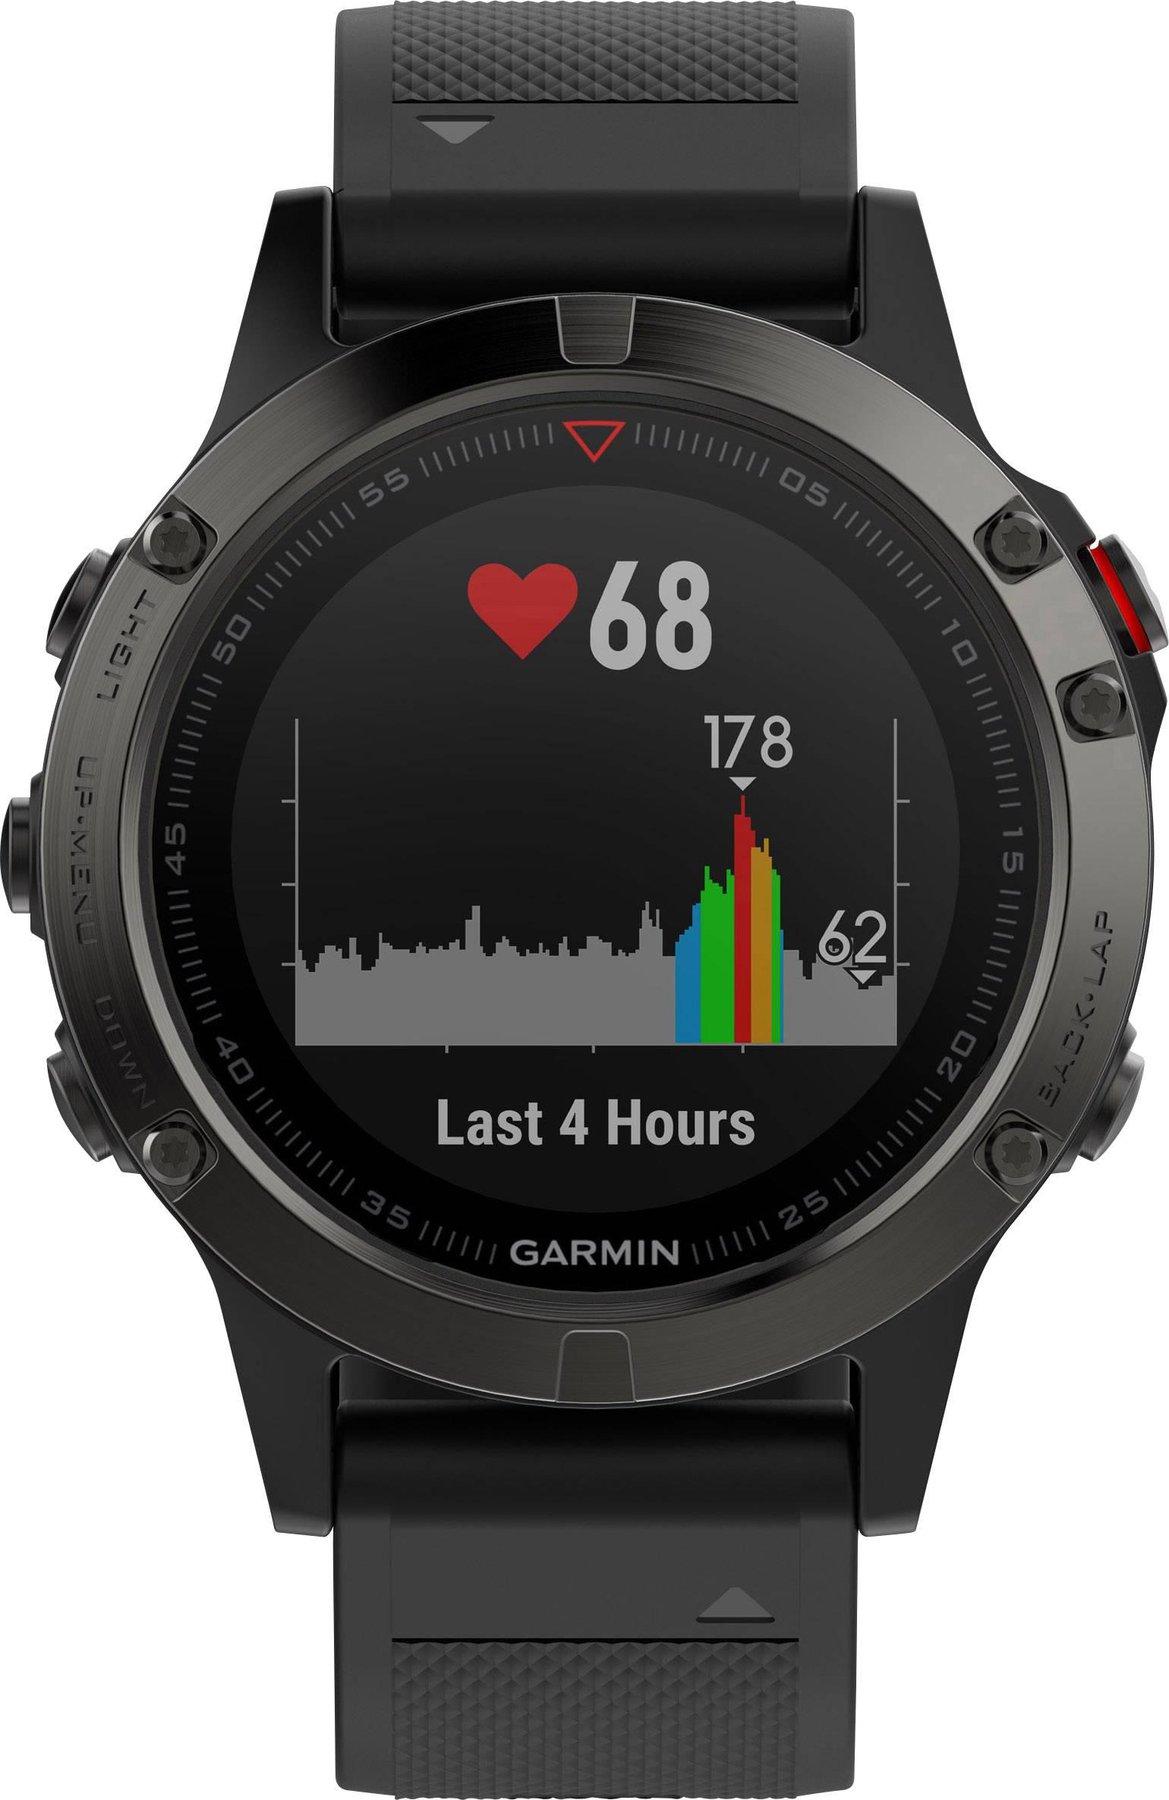 Sportuhr Grau günstig kaufen Garmin Fenix 5 Saphir 47mm GPS Smartwatch